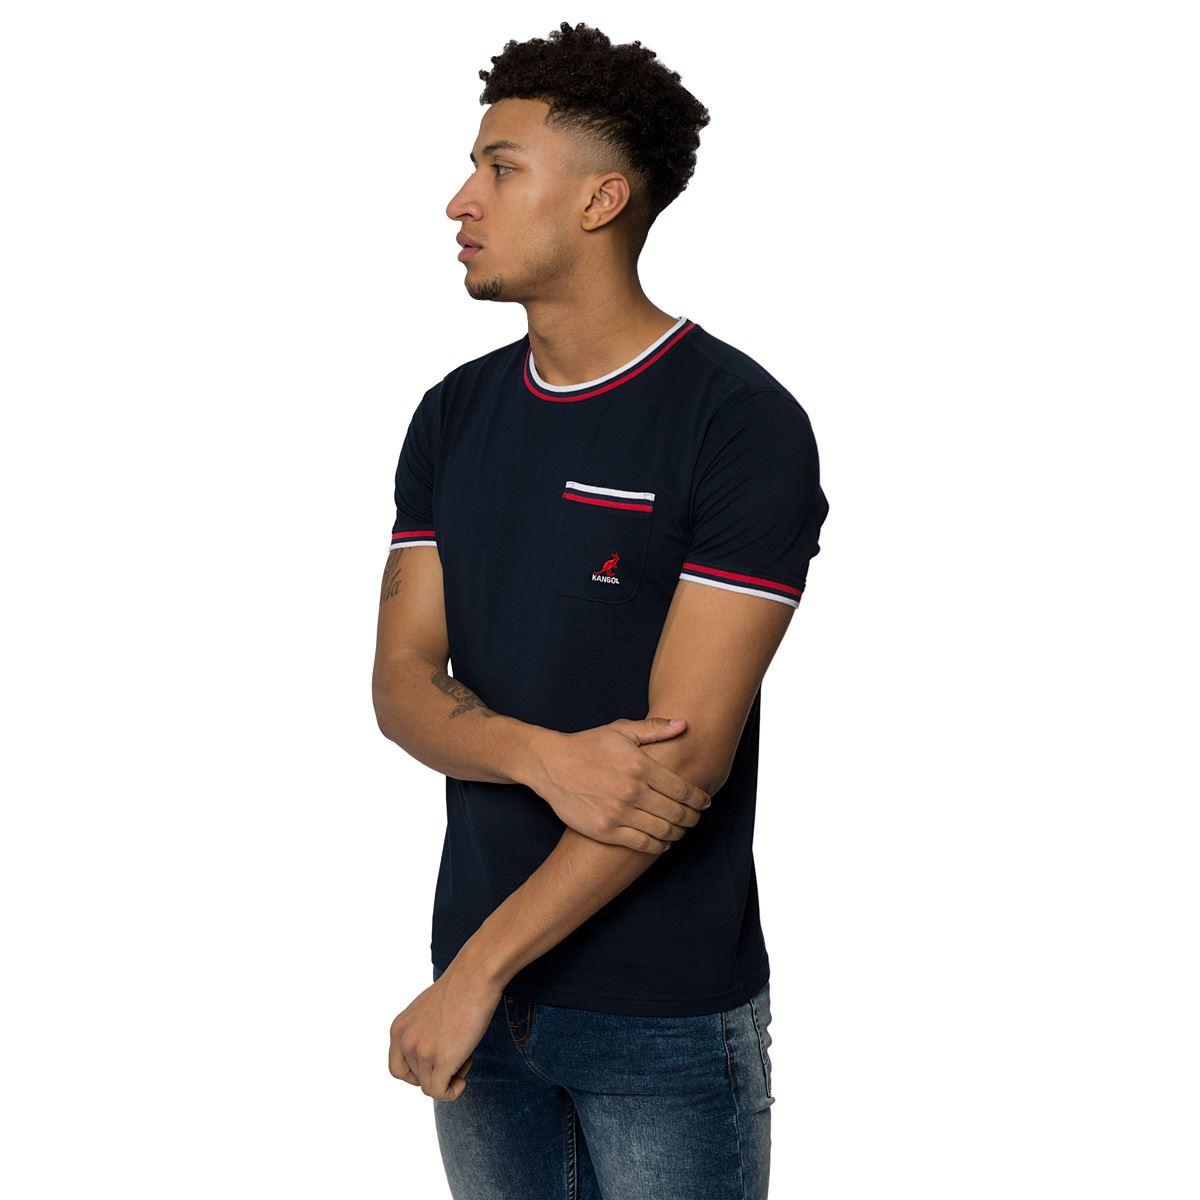 Mens kangol designer cotton top crew neck tee short for Mens crew neck tee shirts